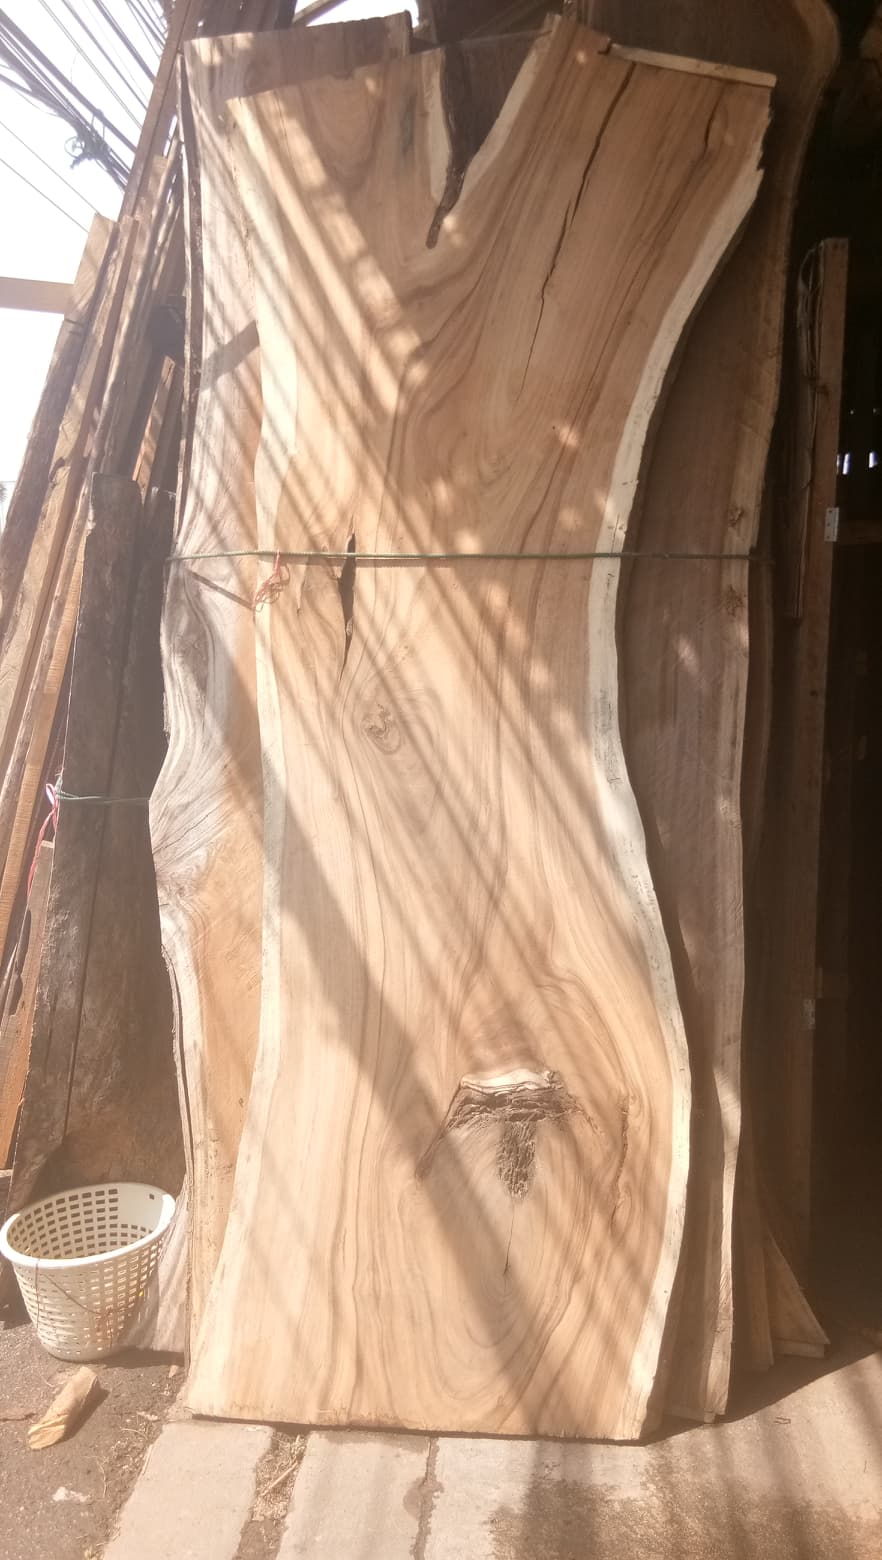 Holzplatte aus Regenbaum Holz  naturelounge24de